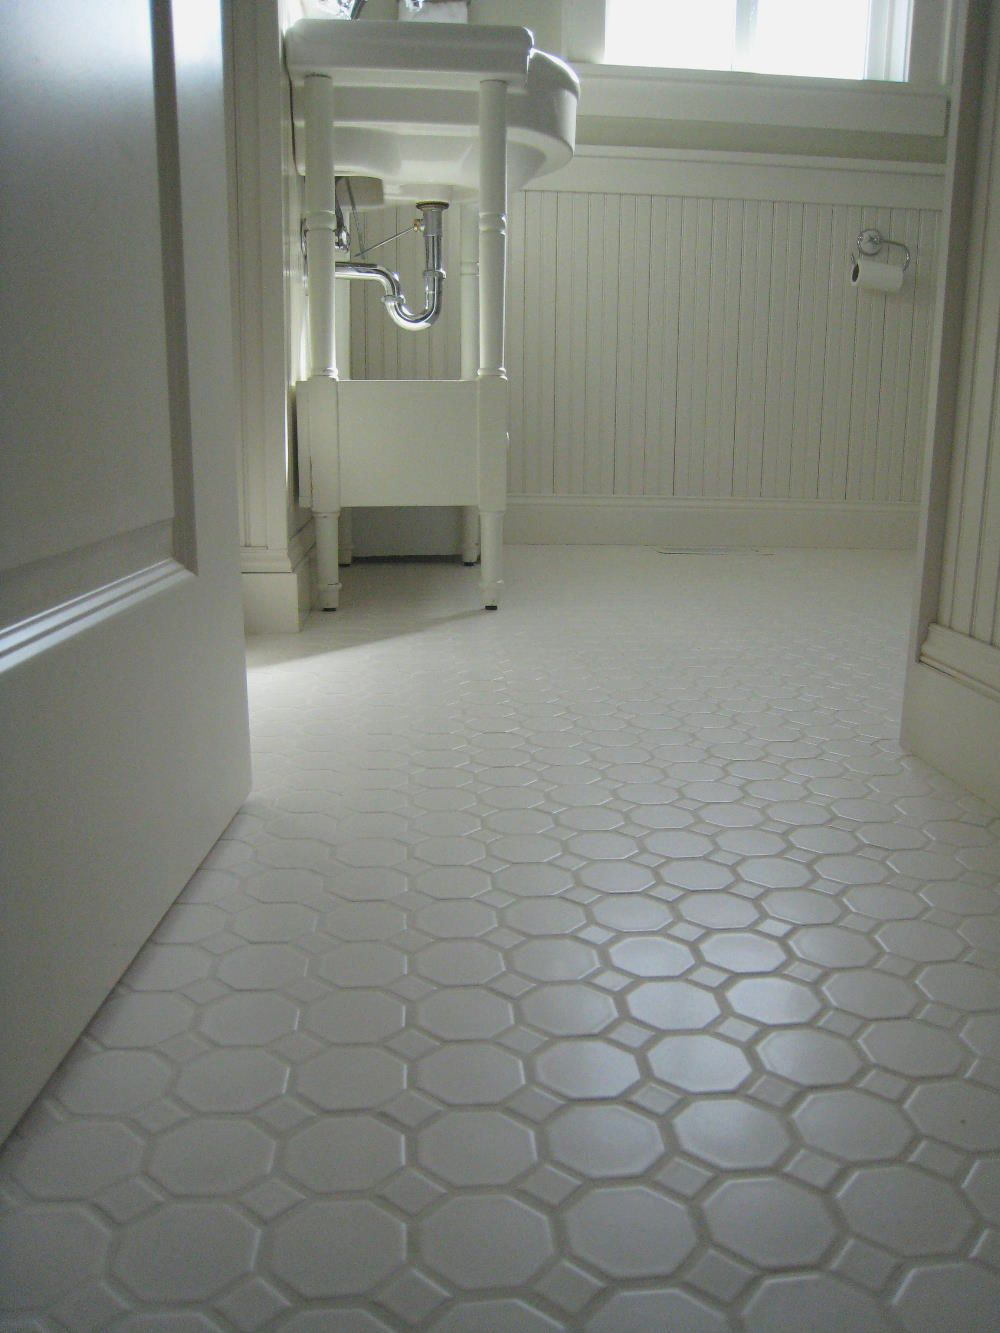 Non Slip Bathroom Floor Tiles more picture Non Slip